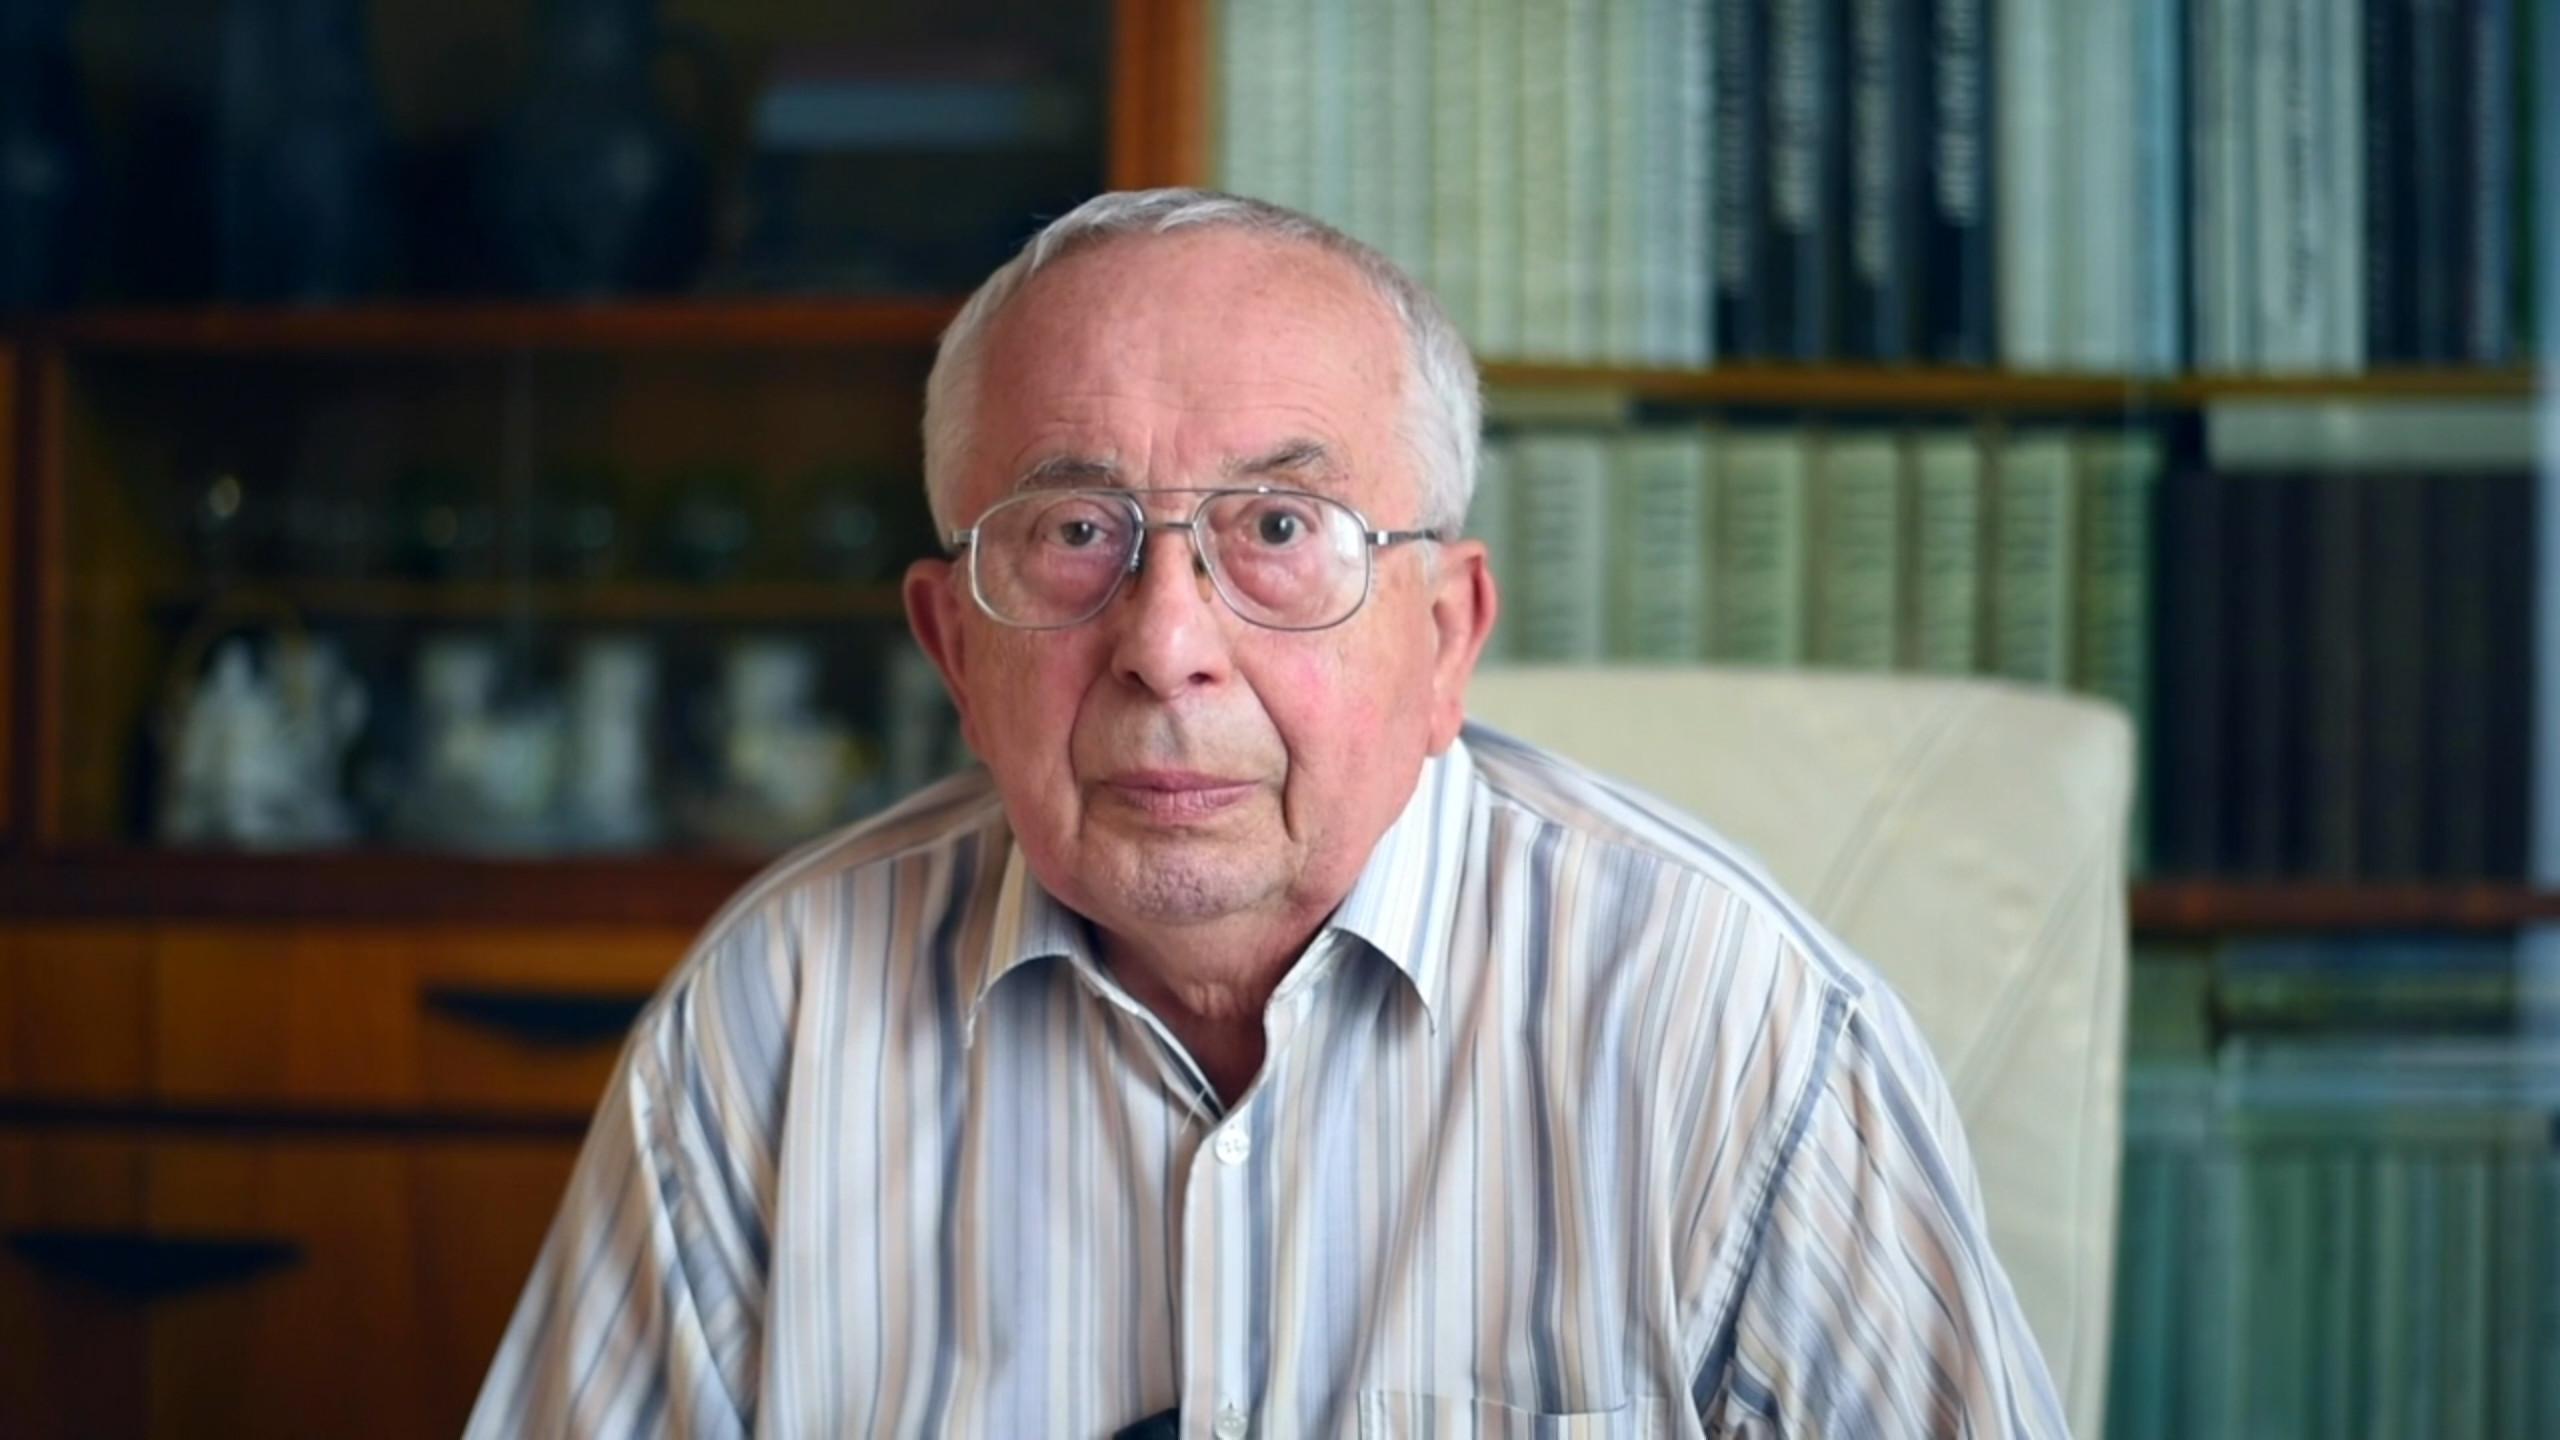 jaderná energie - 65 let: Miroslav Peca – Jadernému reaktoru se vyká - V Česku (peca) 3